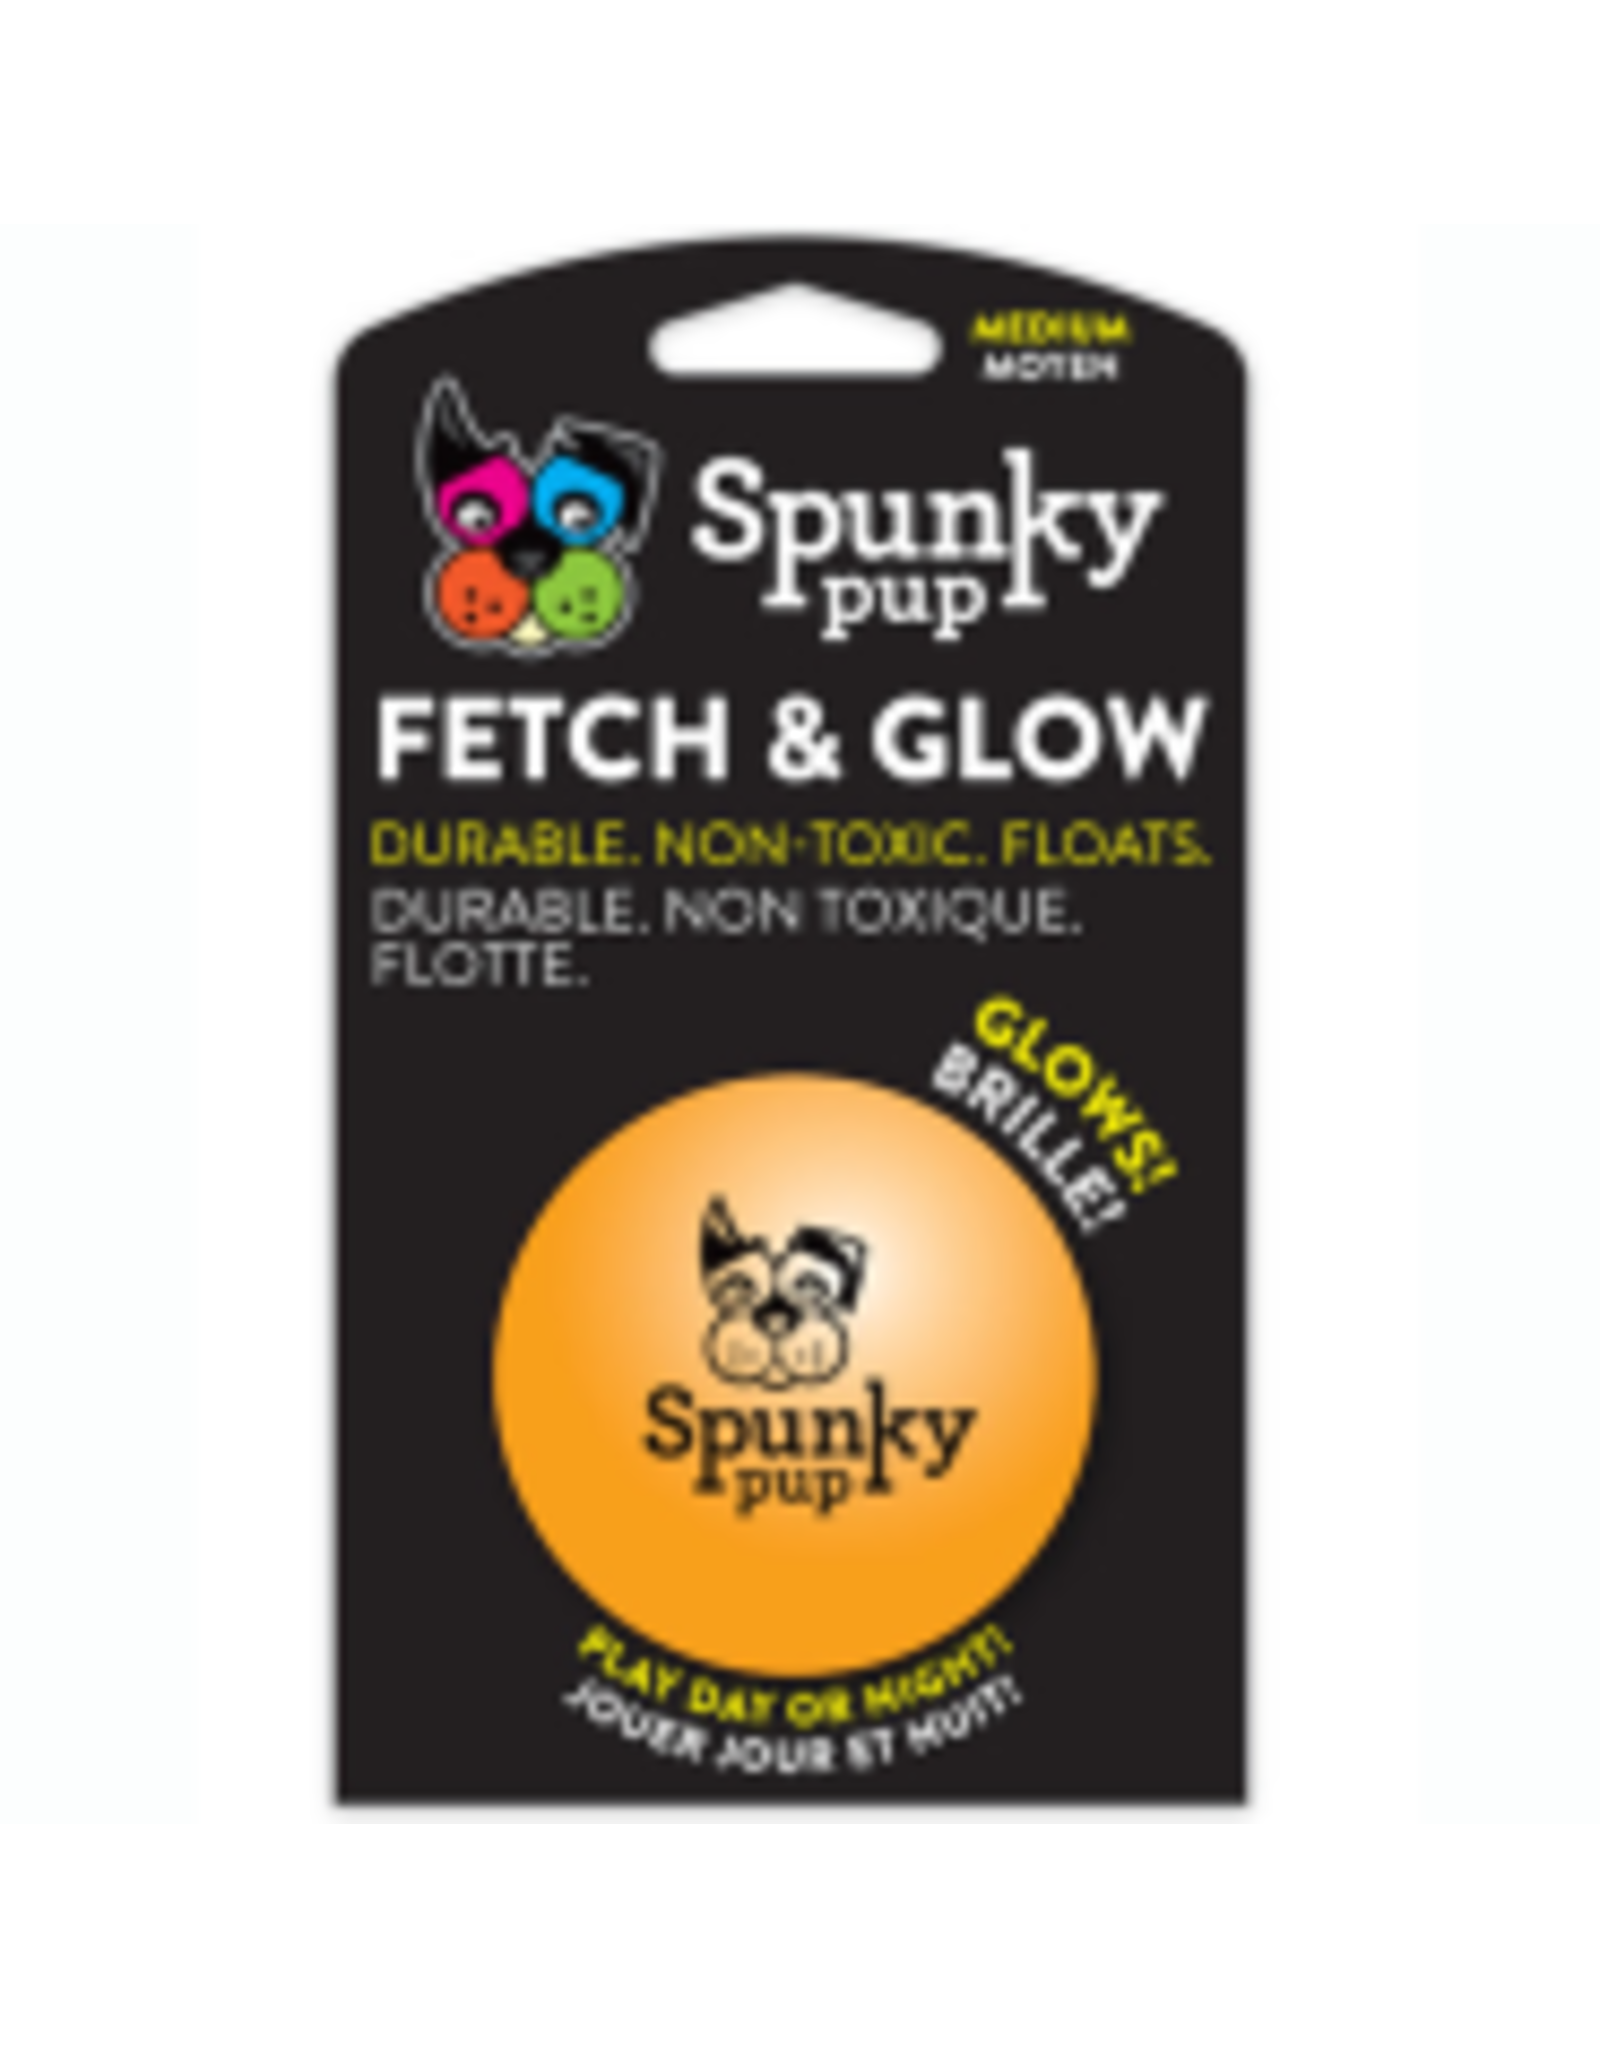 Spunky Pup Spunky Pup - Fetch & Glow Ball